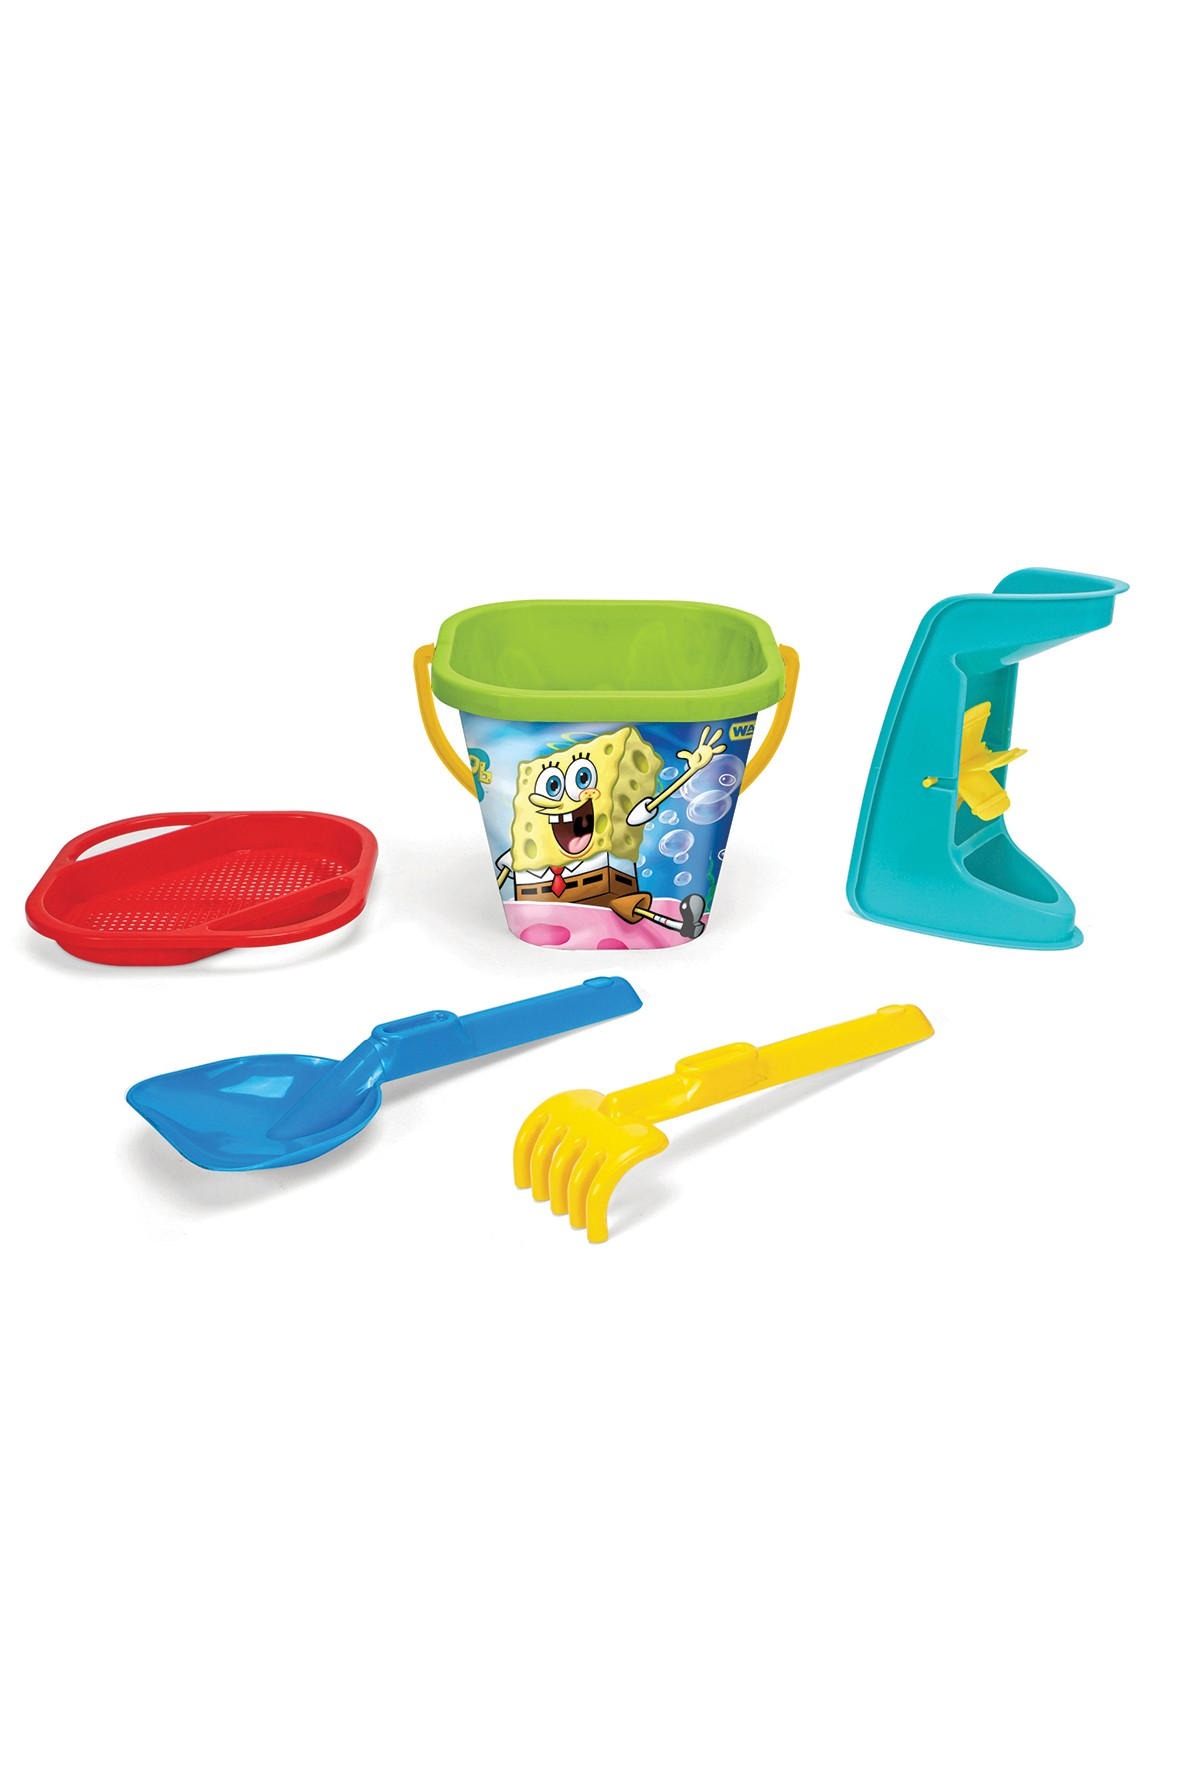 SpongeBob komplet zabawek do piasku - 5 elementów